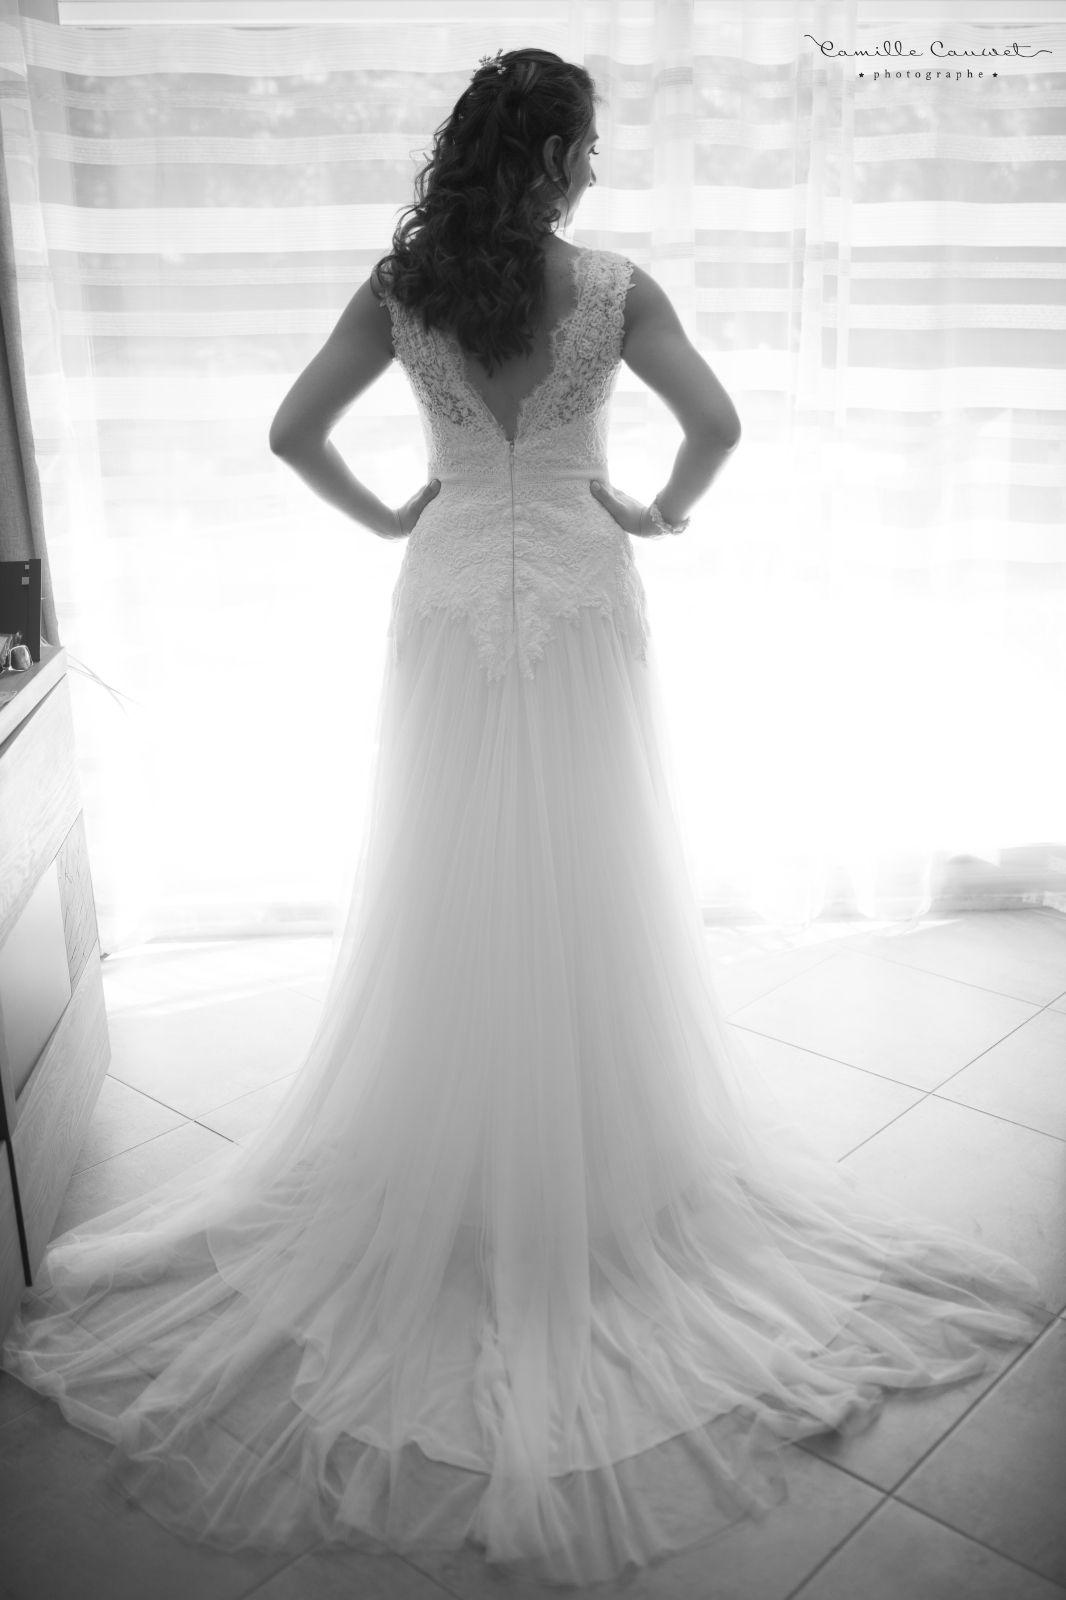 préparatifs de la mariée avec sa robe